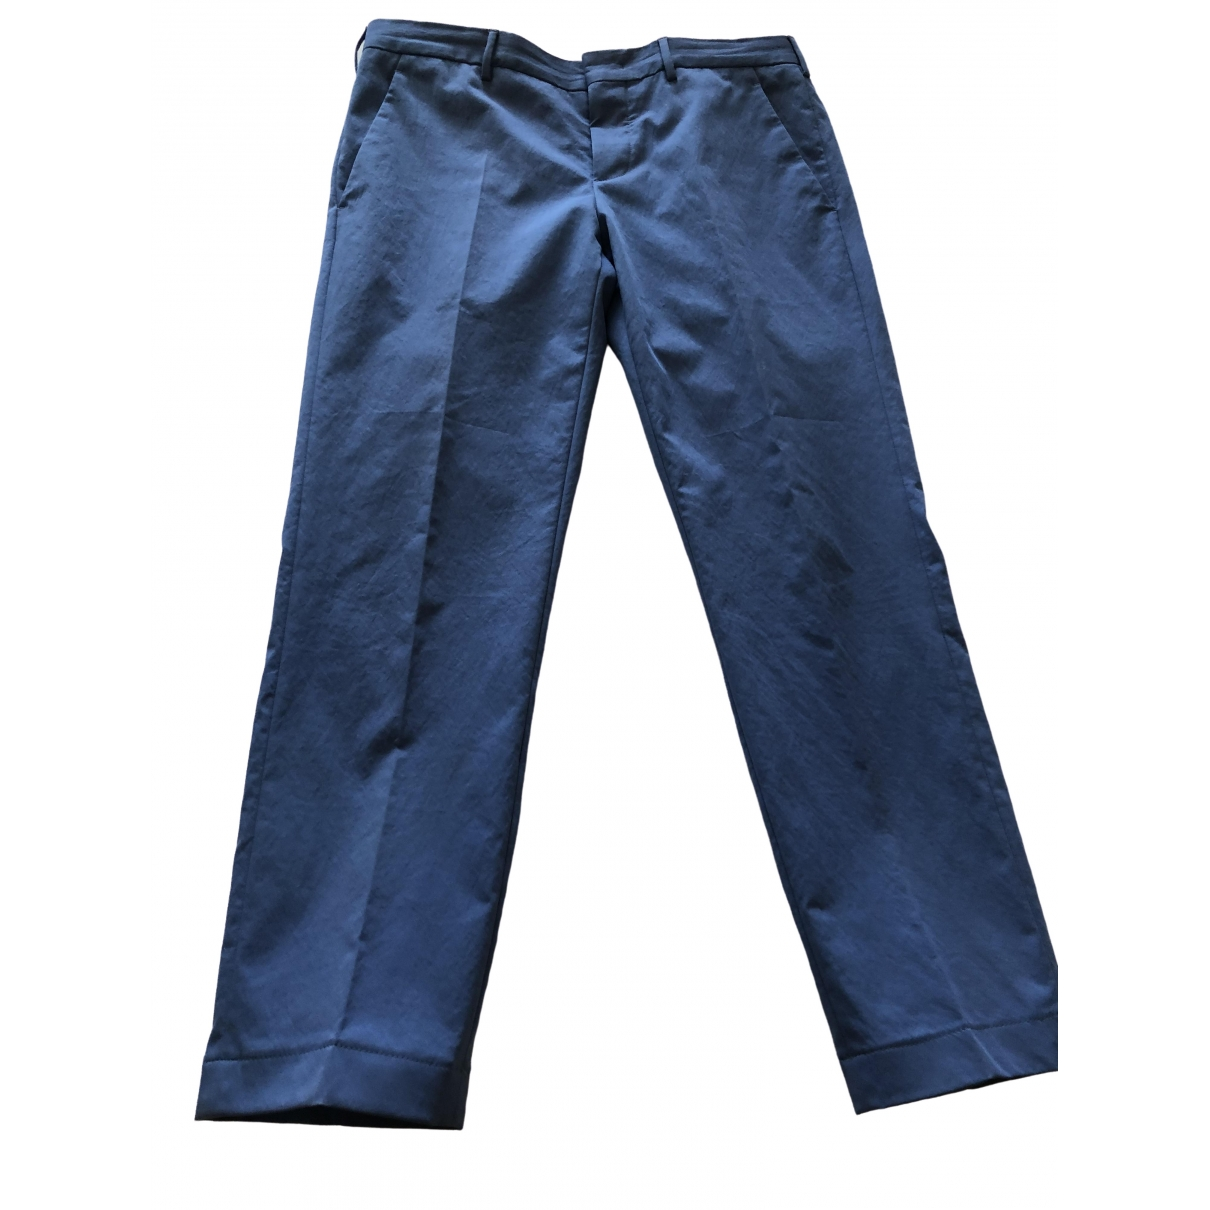 Prada \N Navy Trousers for Men 48 IT